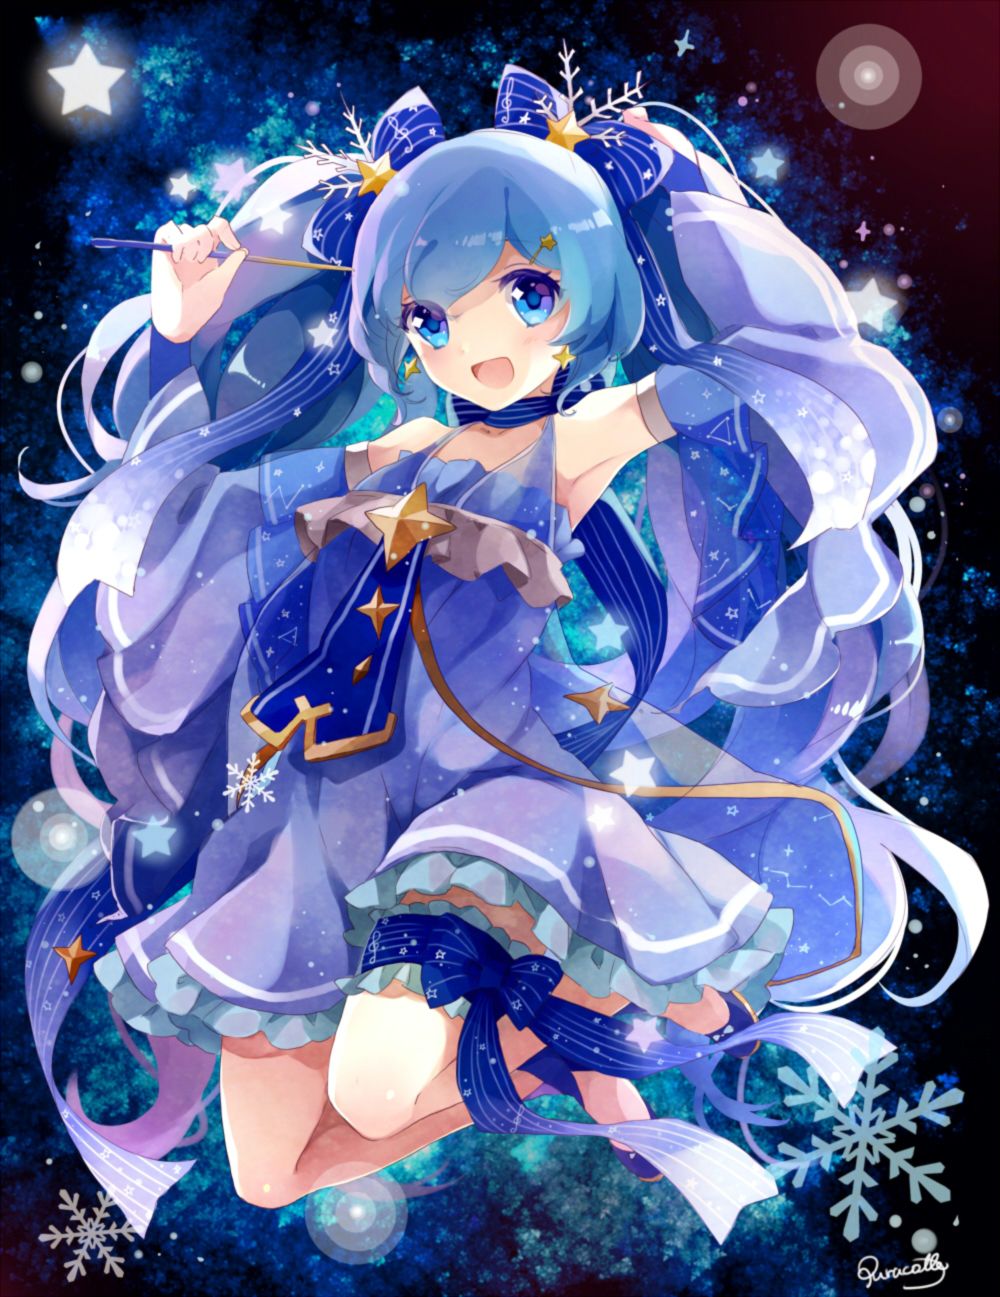 Dark purple and blue hair